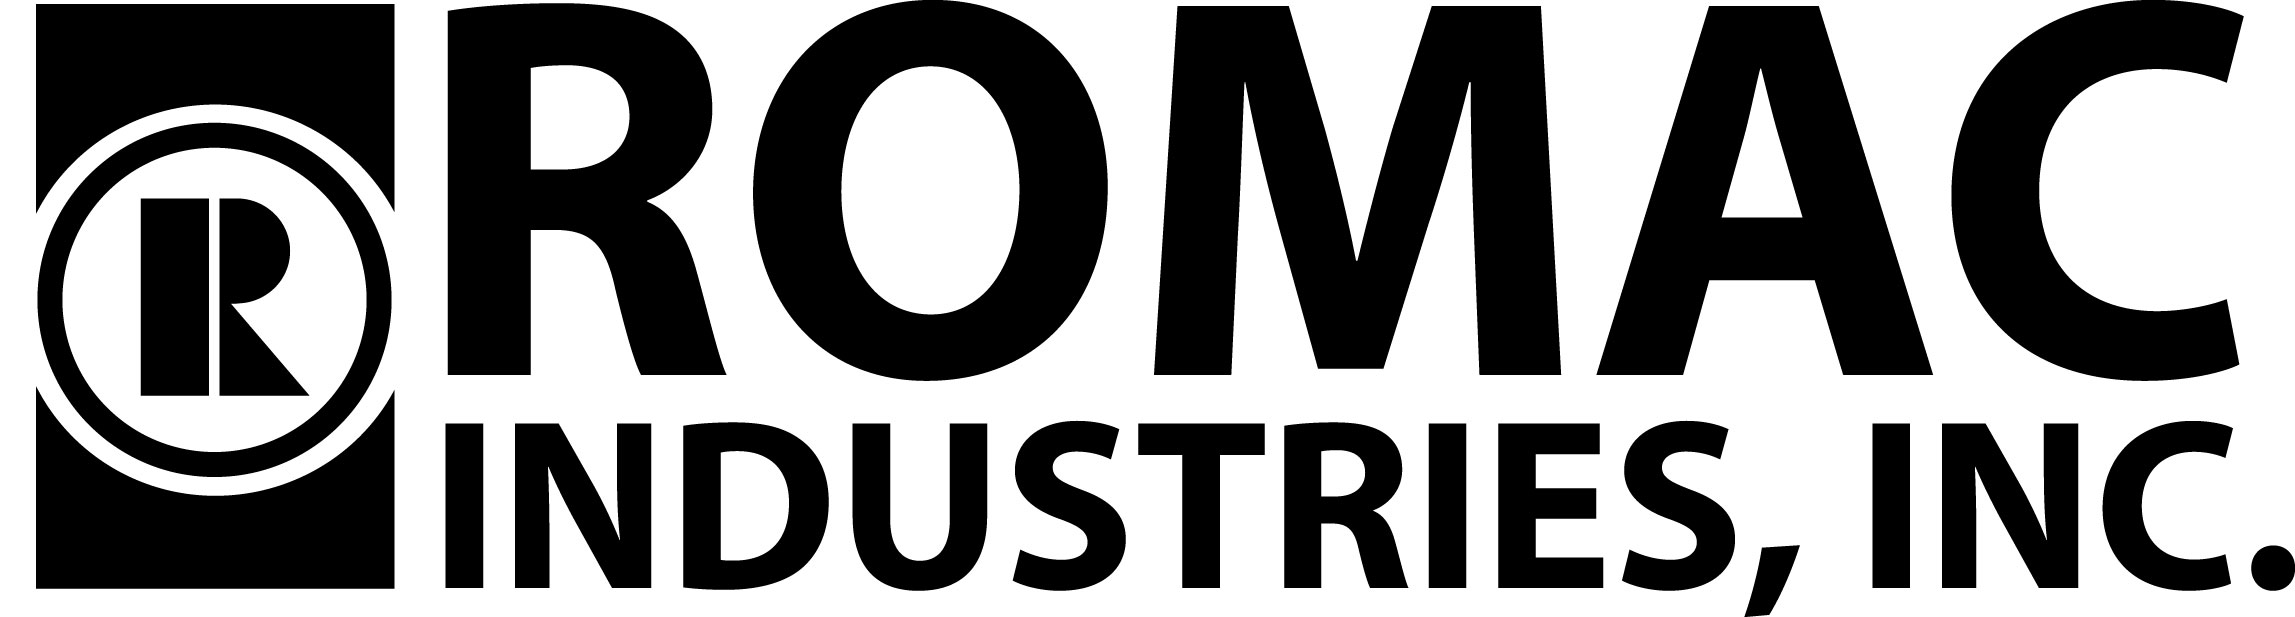 Romac Industries logo